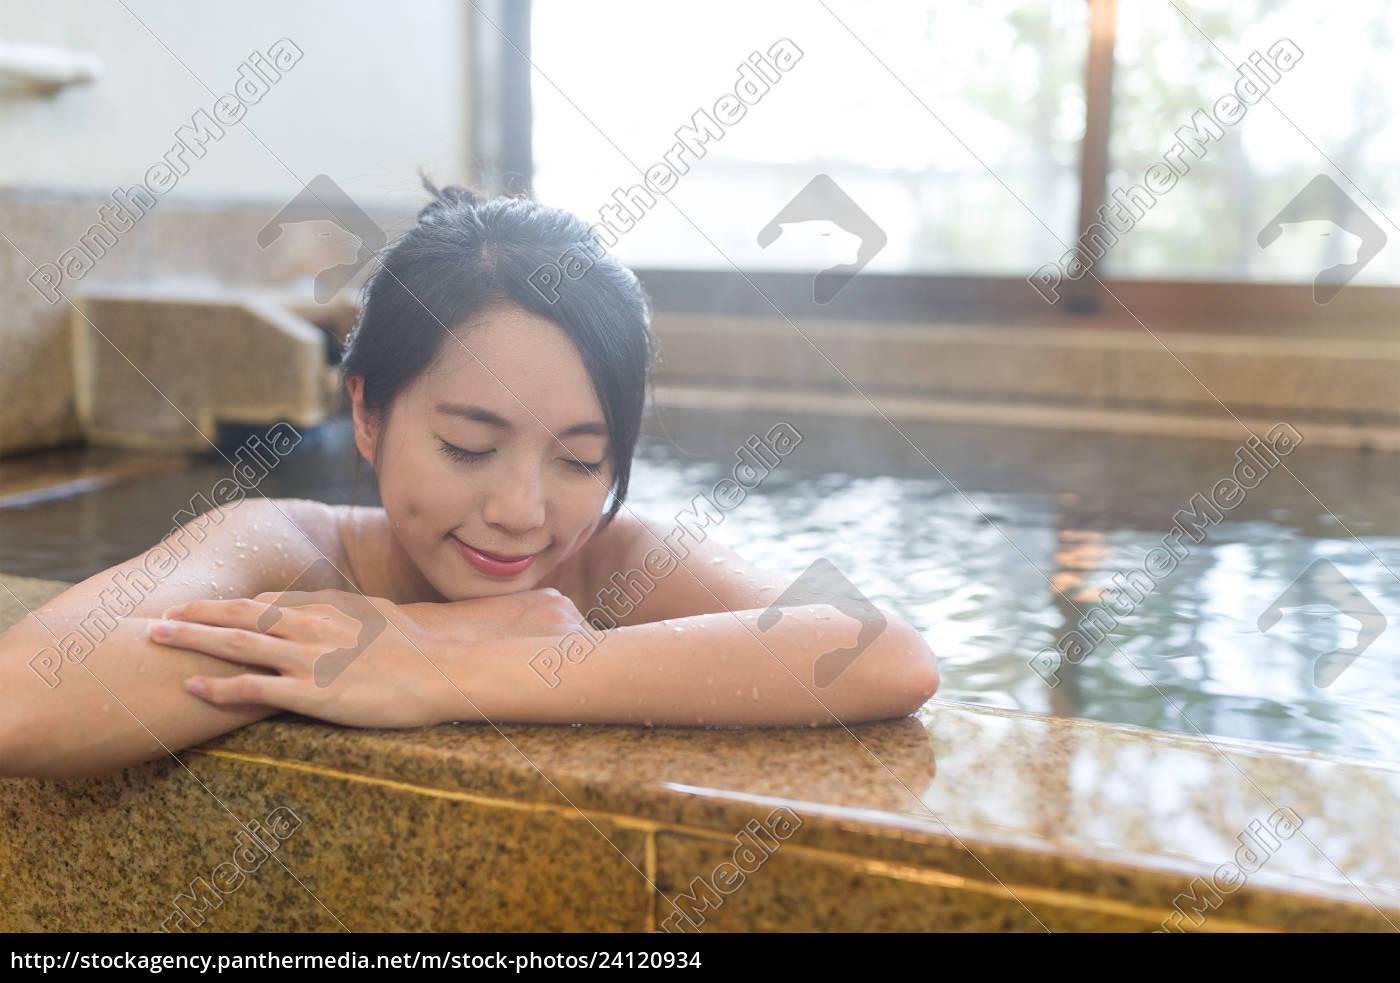 Stock image 24120934 Woman enjoy japanese hot spring